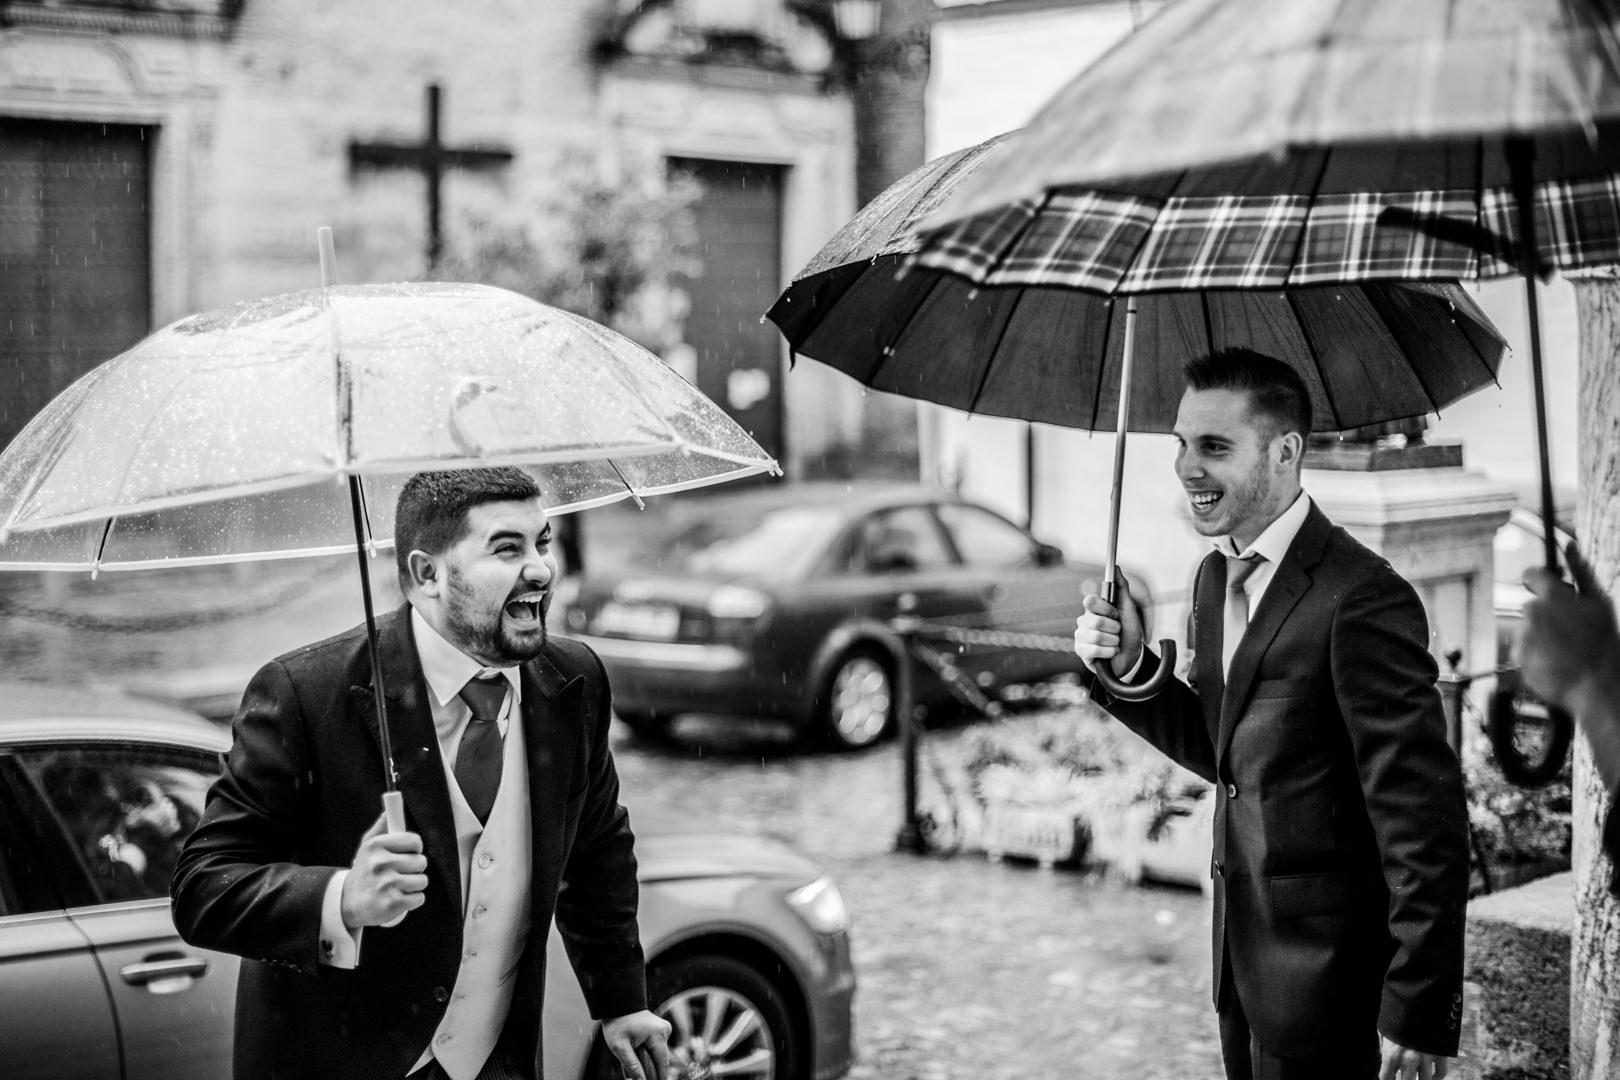 Boda-sevilla-Wedding-engagement-Rafael-Torres-fotografo-bodas-sevilla-madrid-barcelona-wedding-photographer--40.jpg